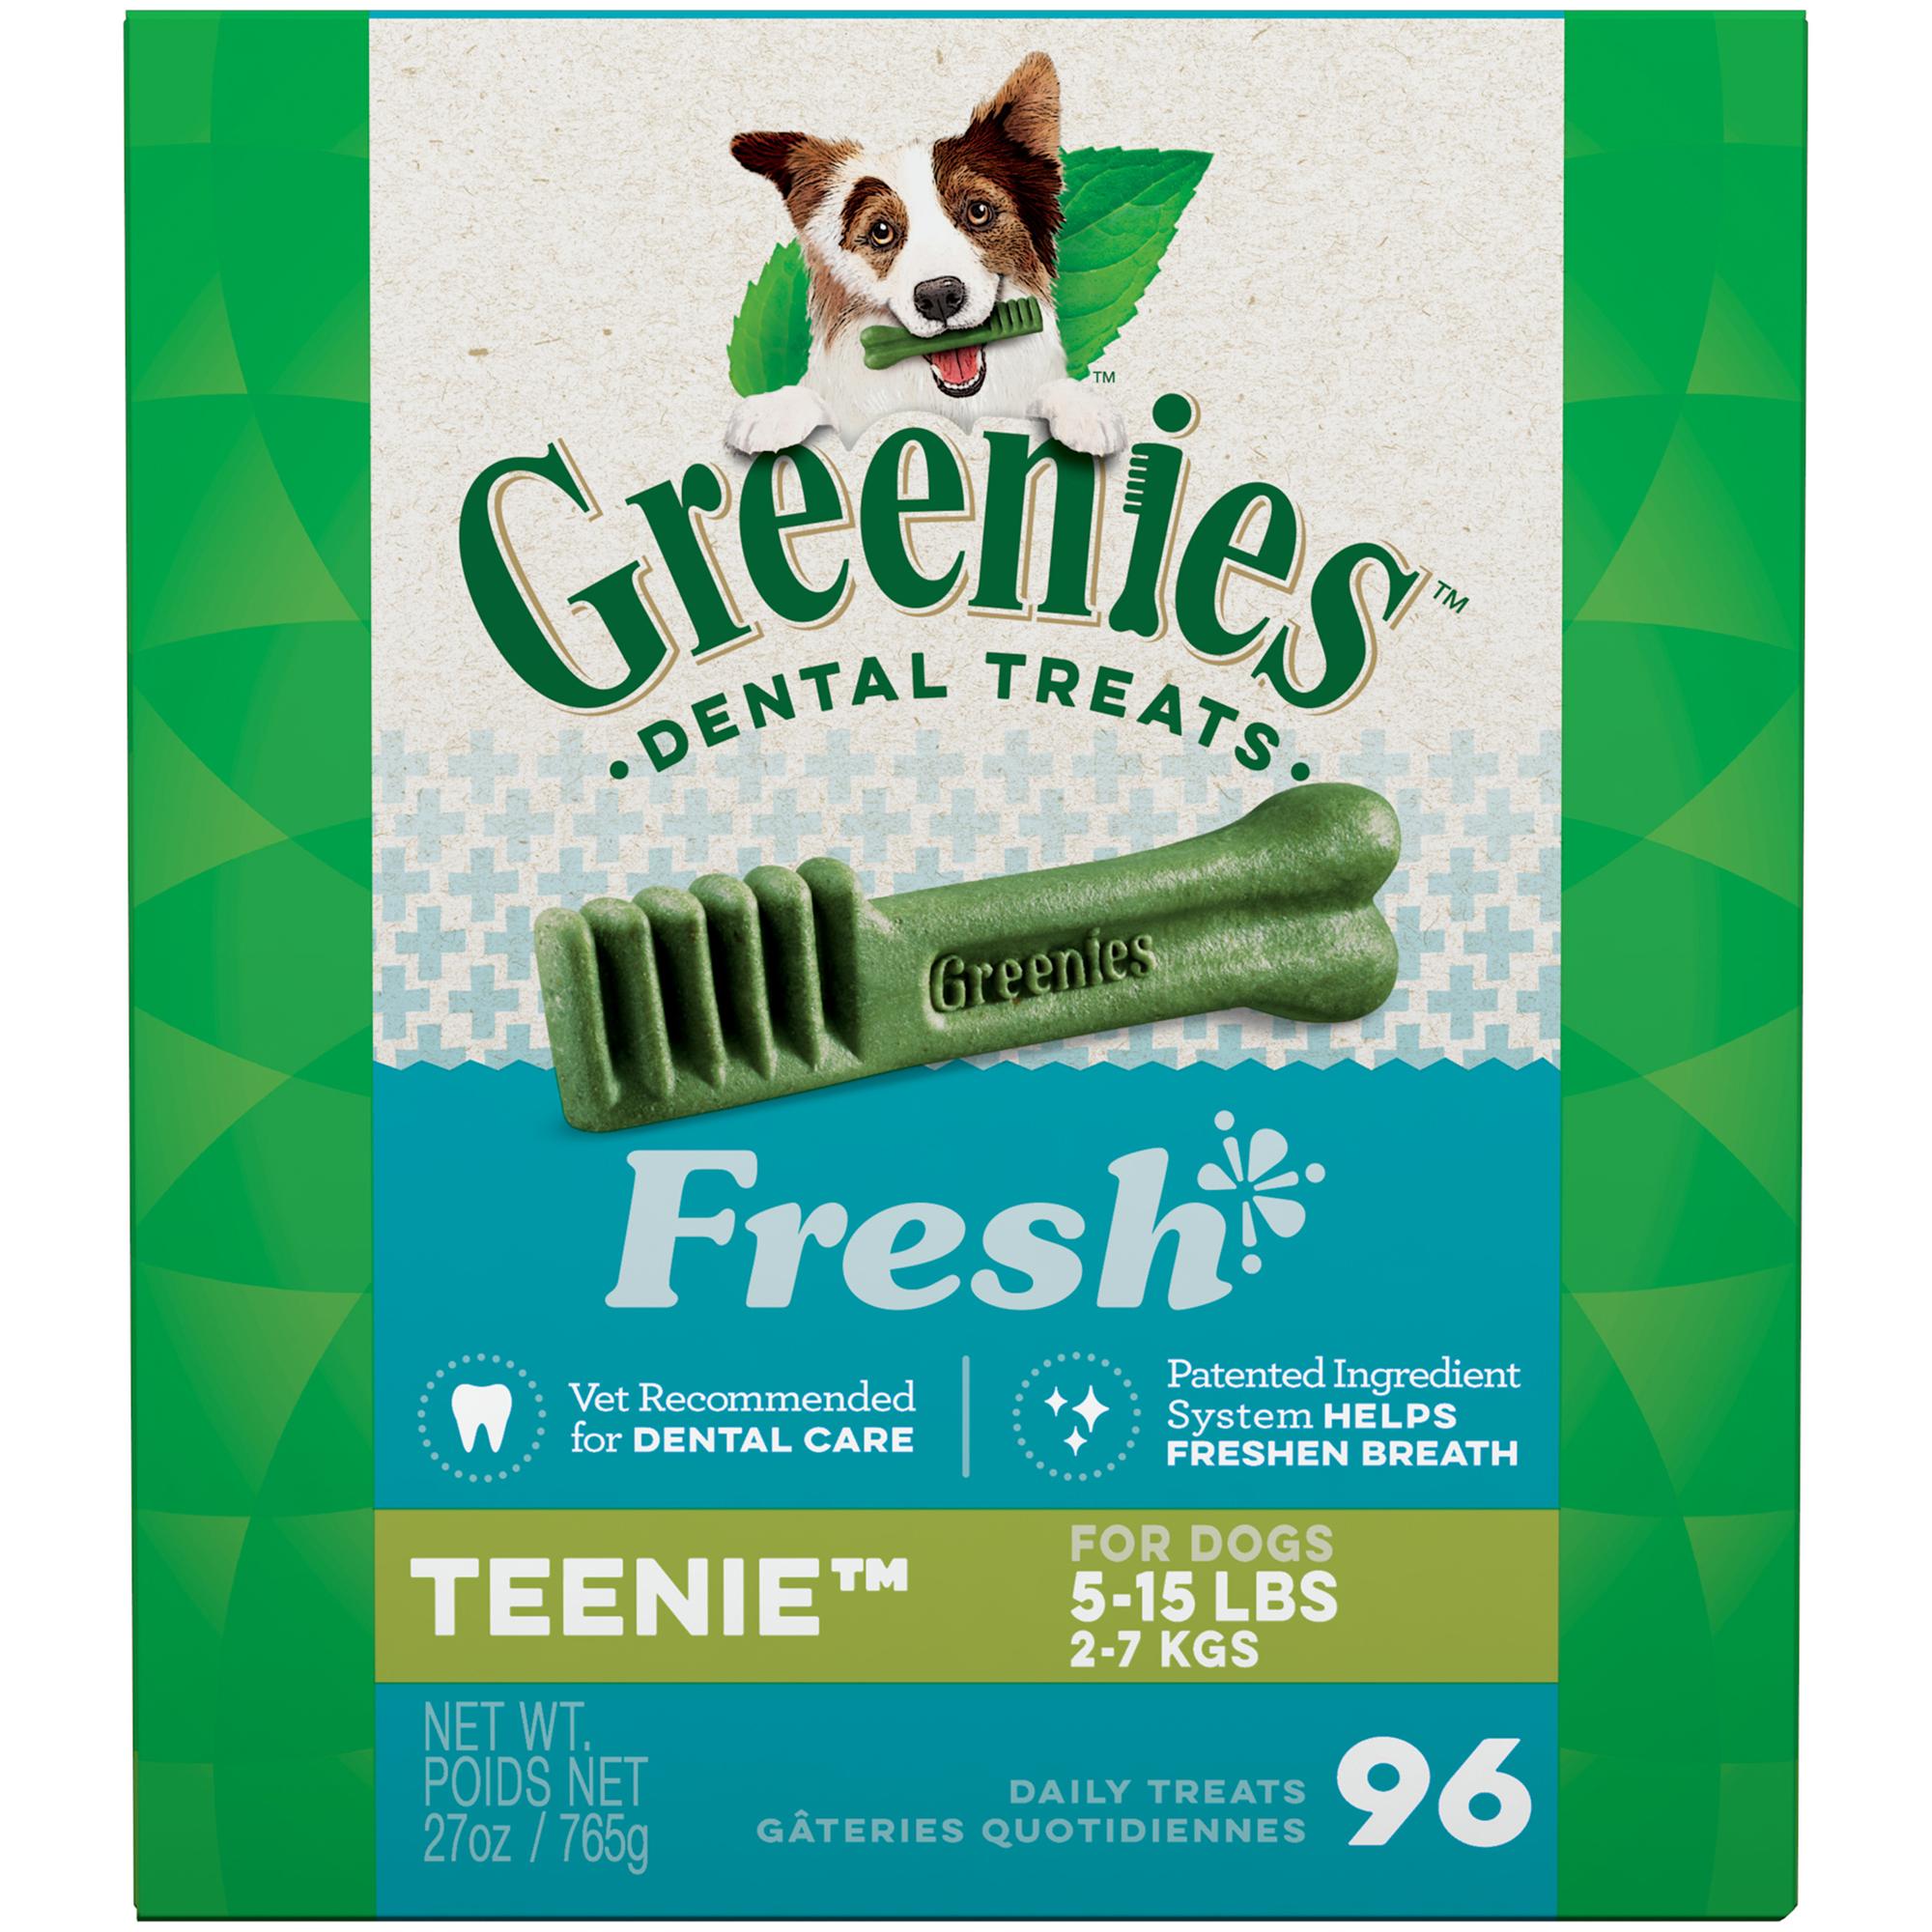 Greenies Teenie Natural Dental Dog Treats Fresh Flavor, 27 oz. Pack (96 Count) $14.14